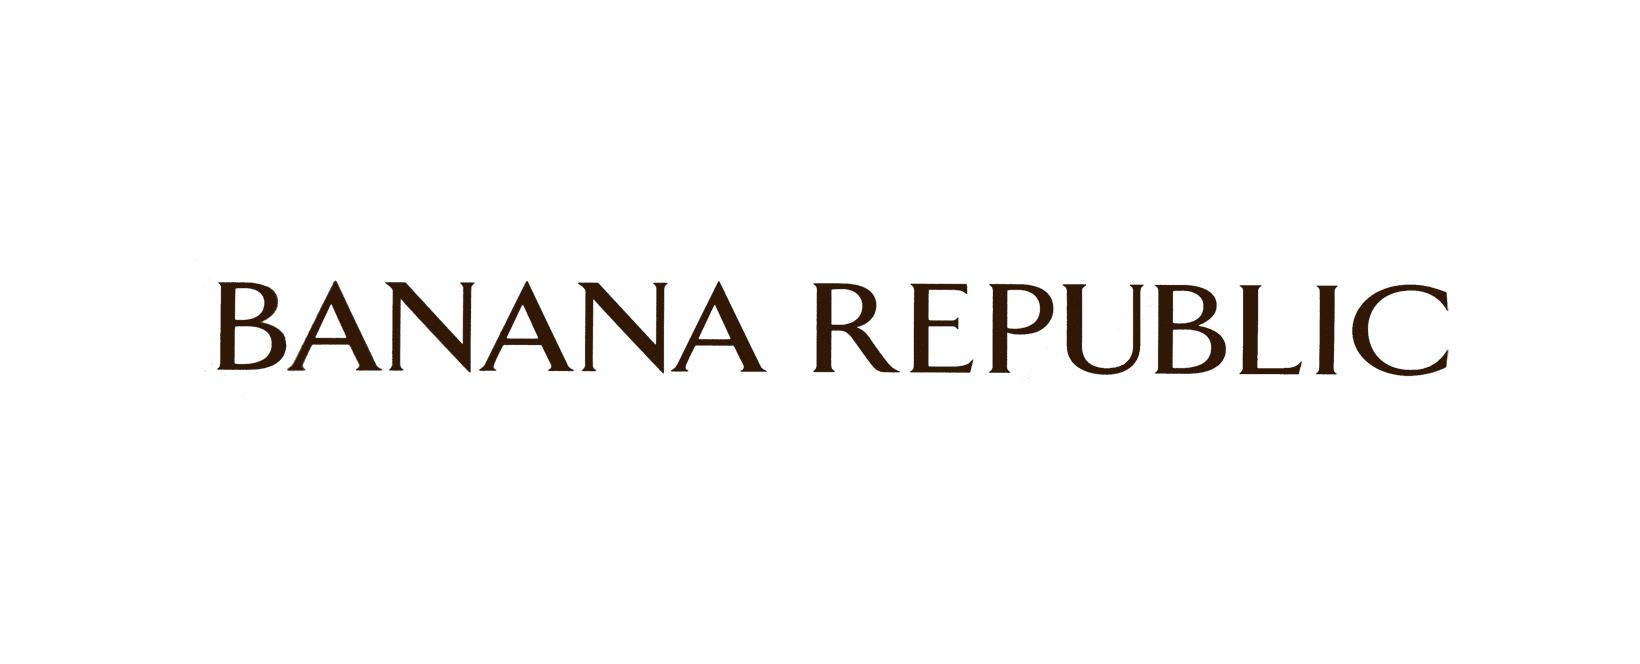 Banana Republic UK Discount Code 2021